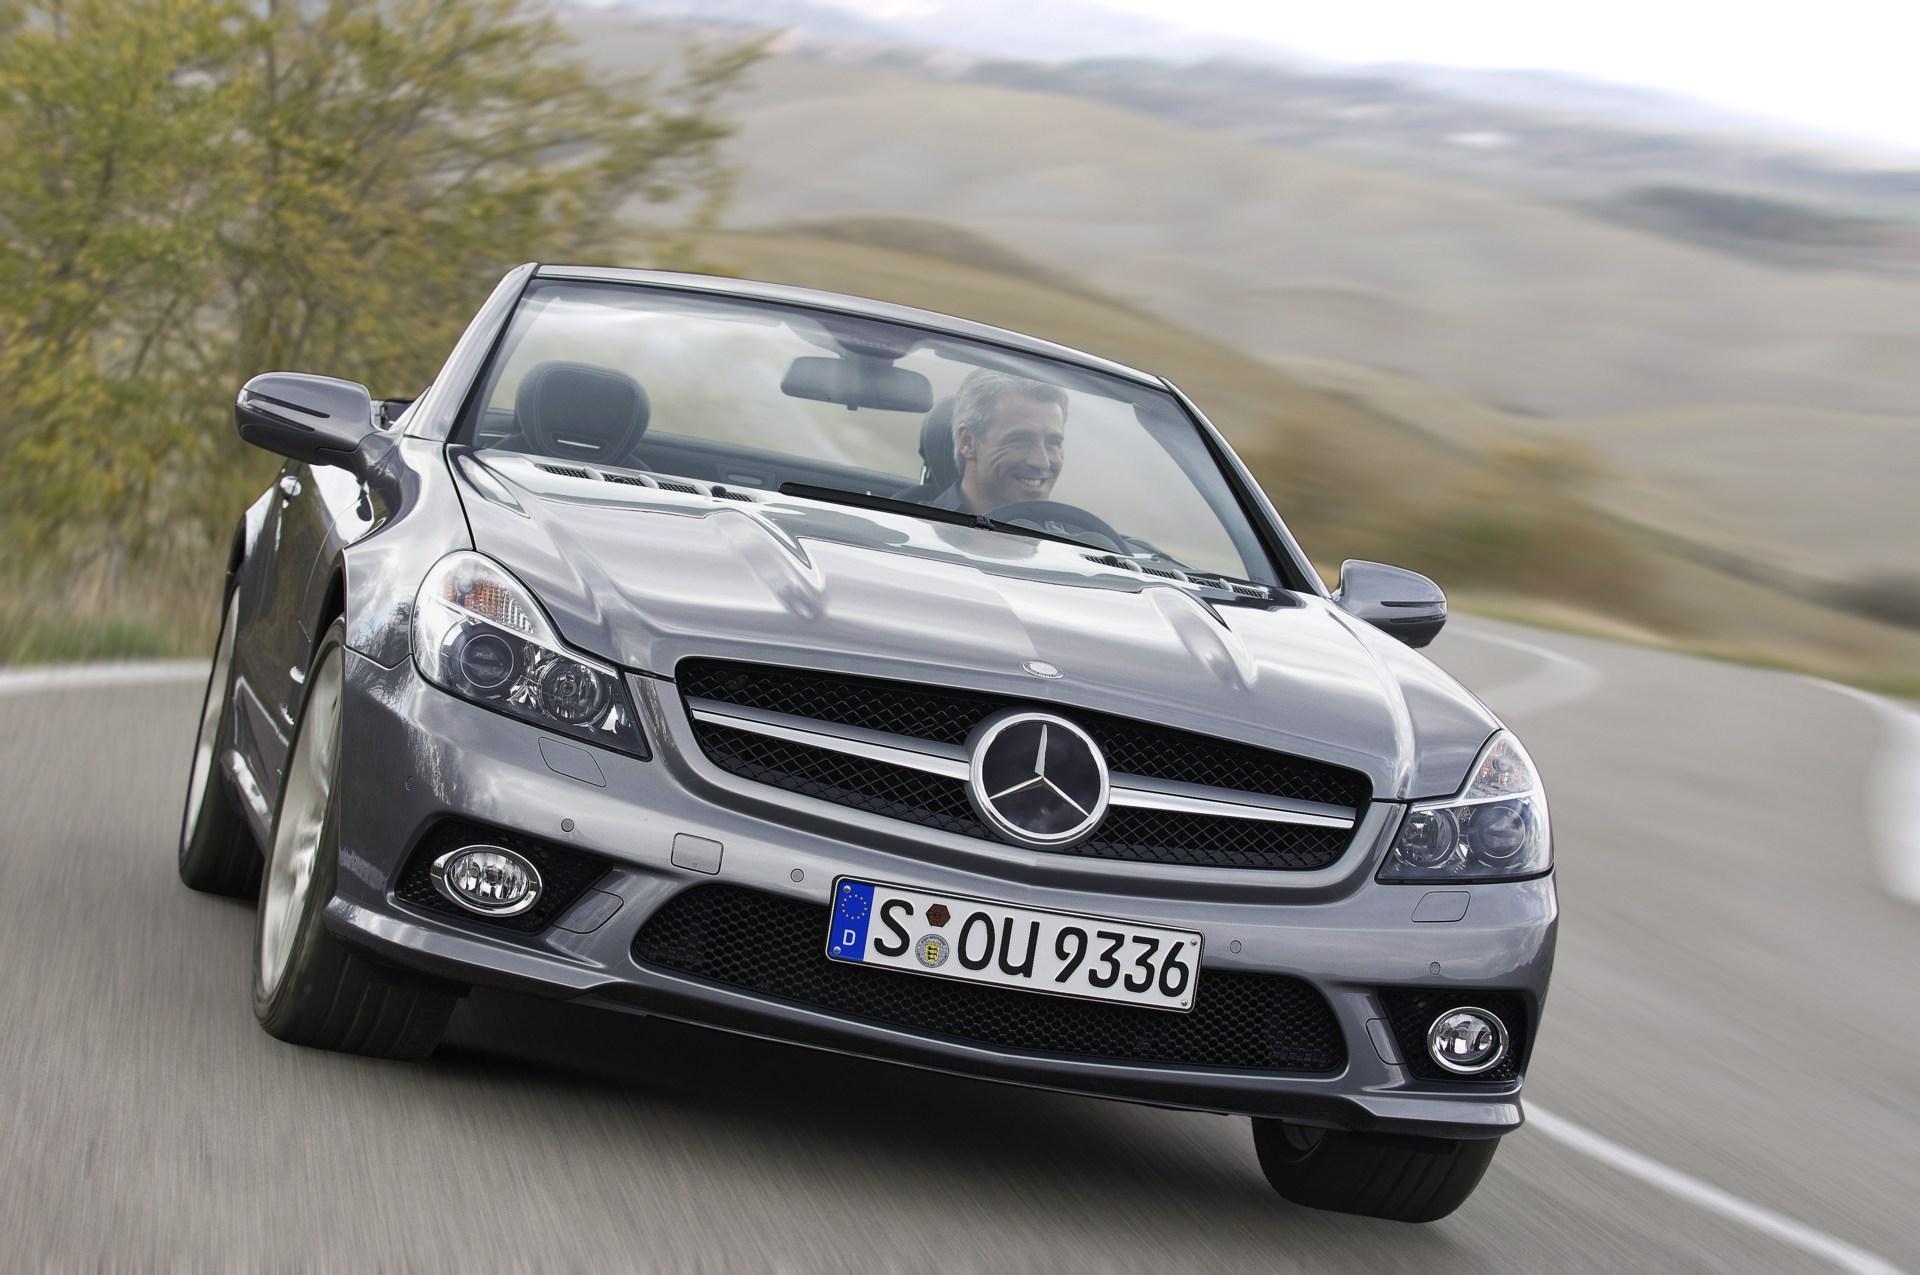 MercedesBenz SL 600 technical details history photos on Better